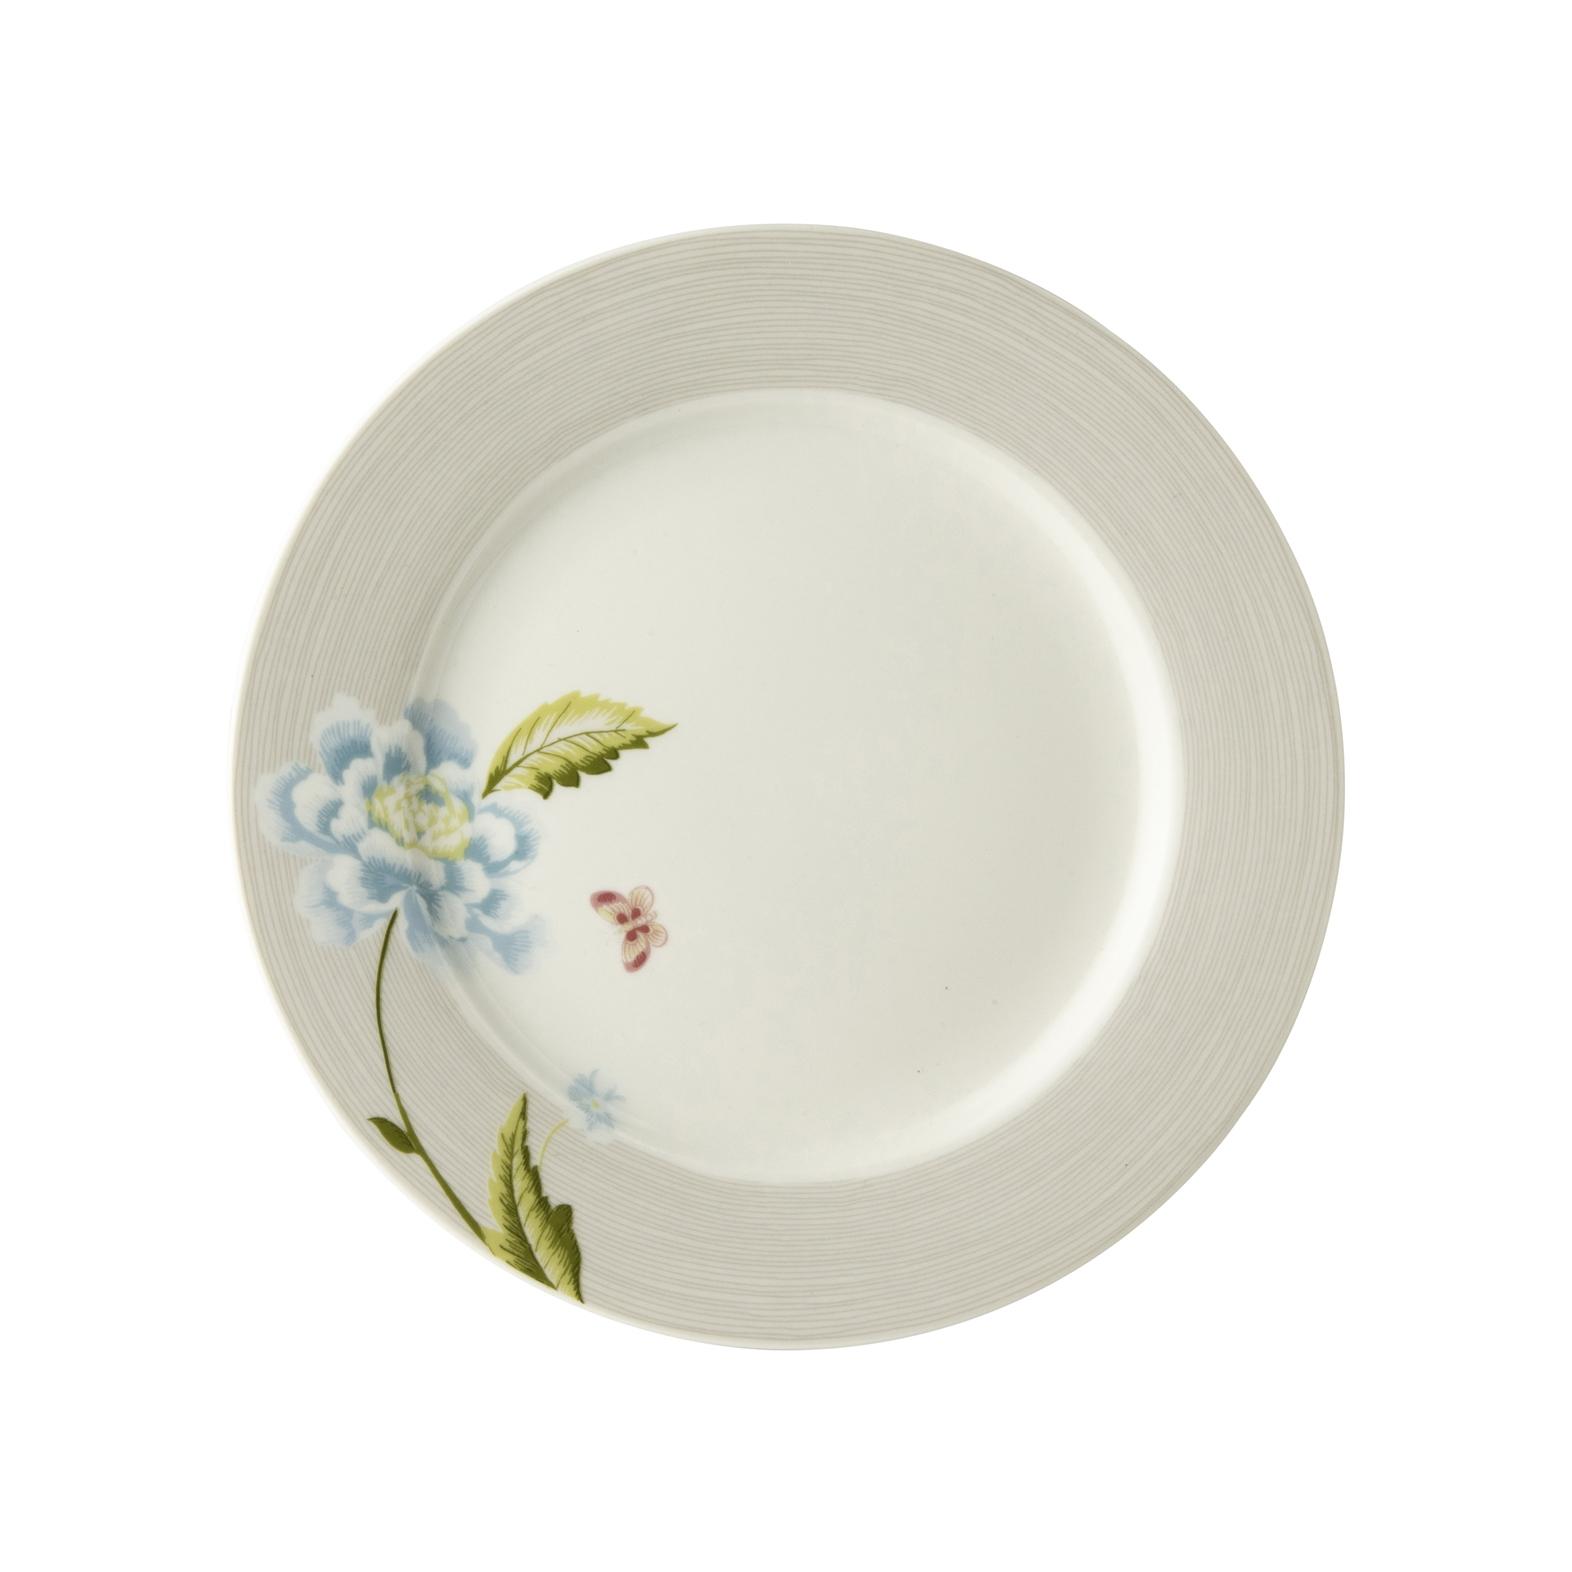 "Онлайн каталог PROMENU: Тарелка десертная ""Цветок"" Laura Ashley HERITAGE, диаметр 20 см, серый с цветком                                   180446"